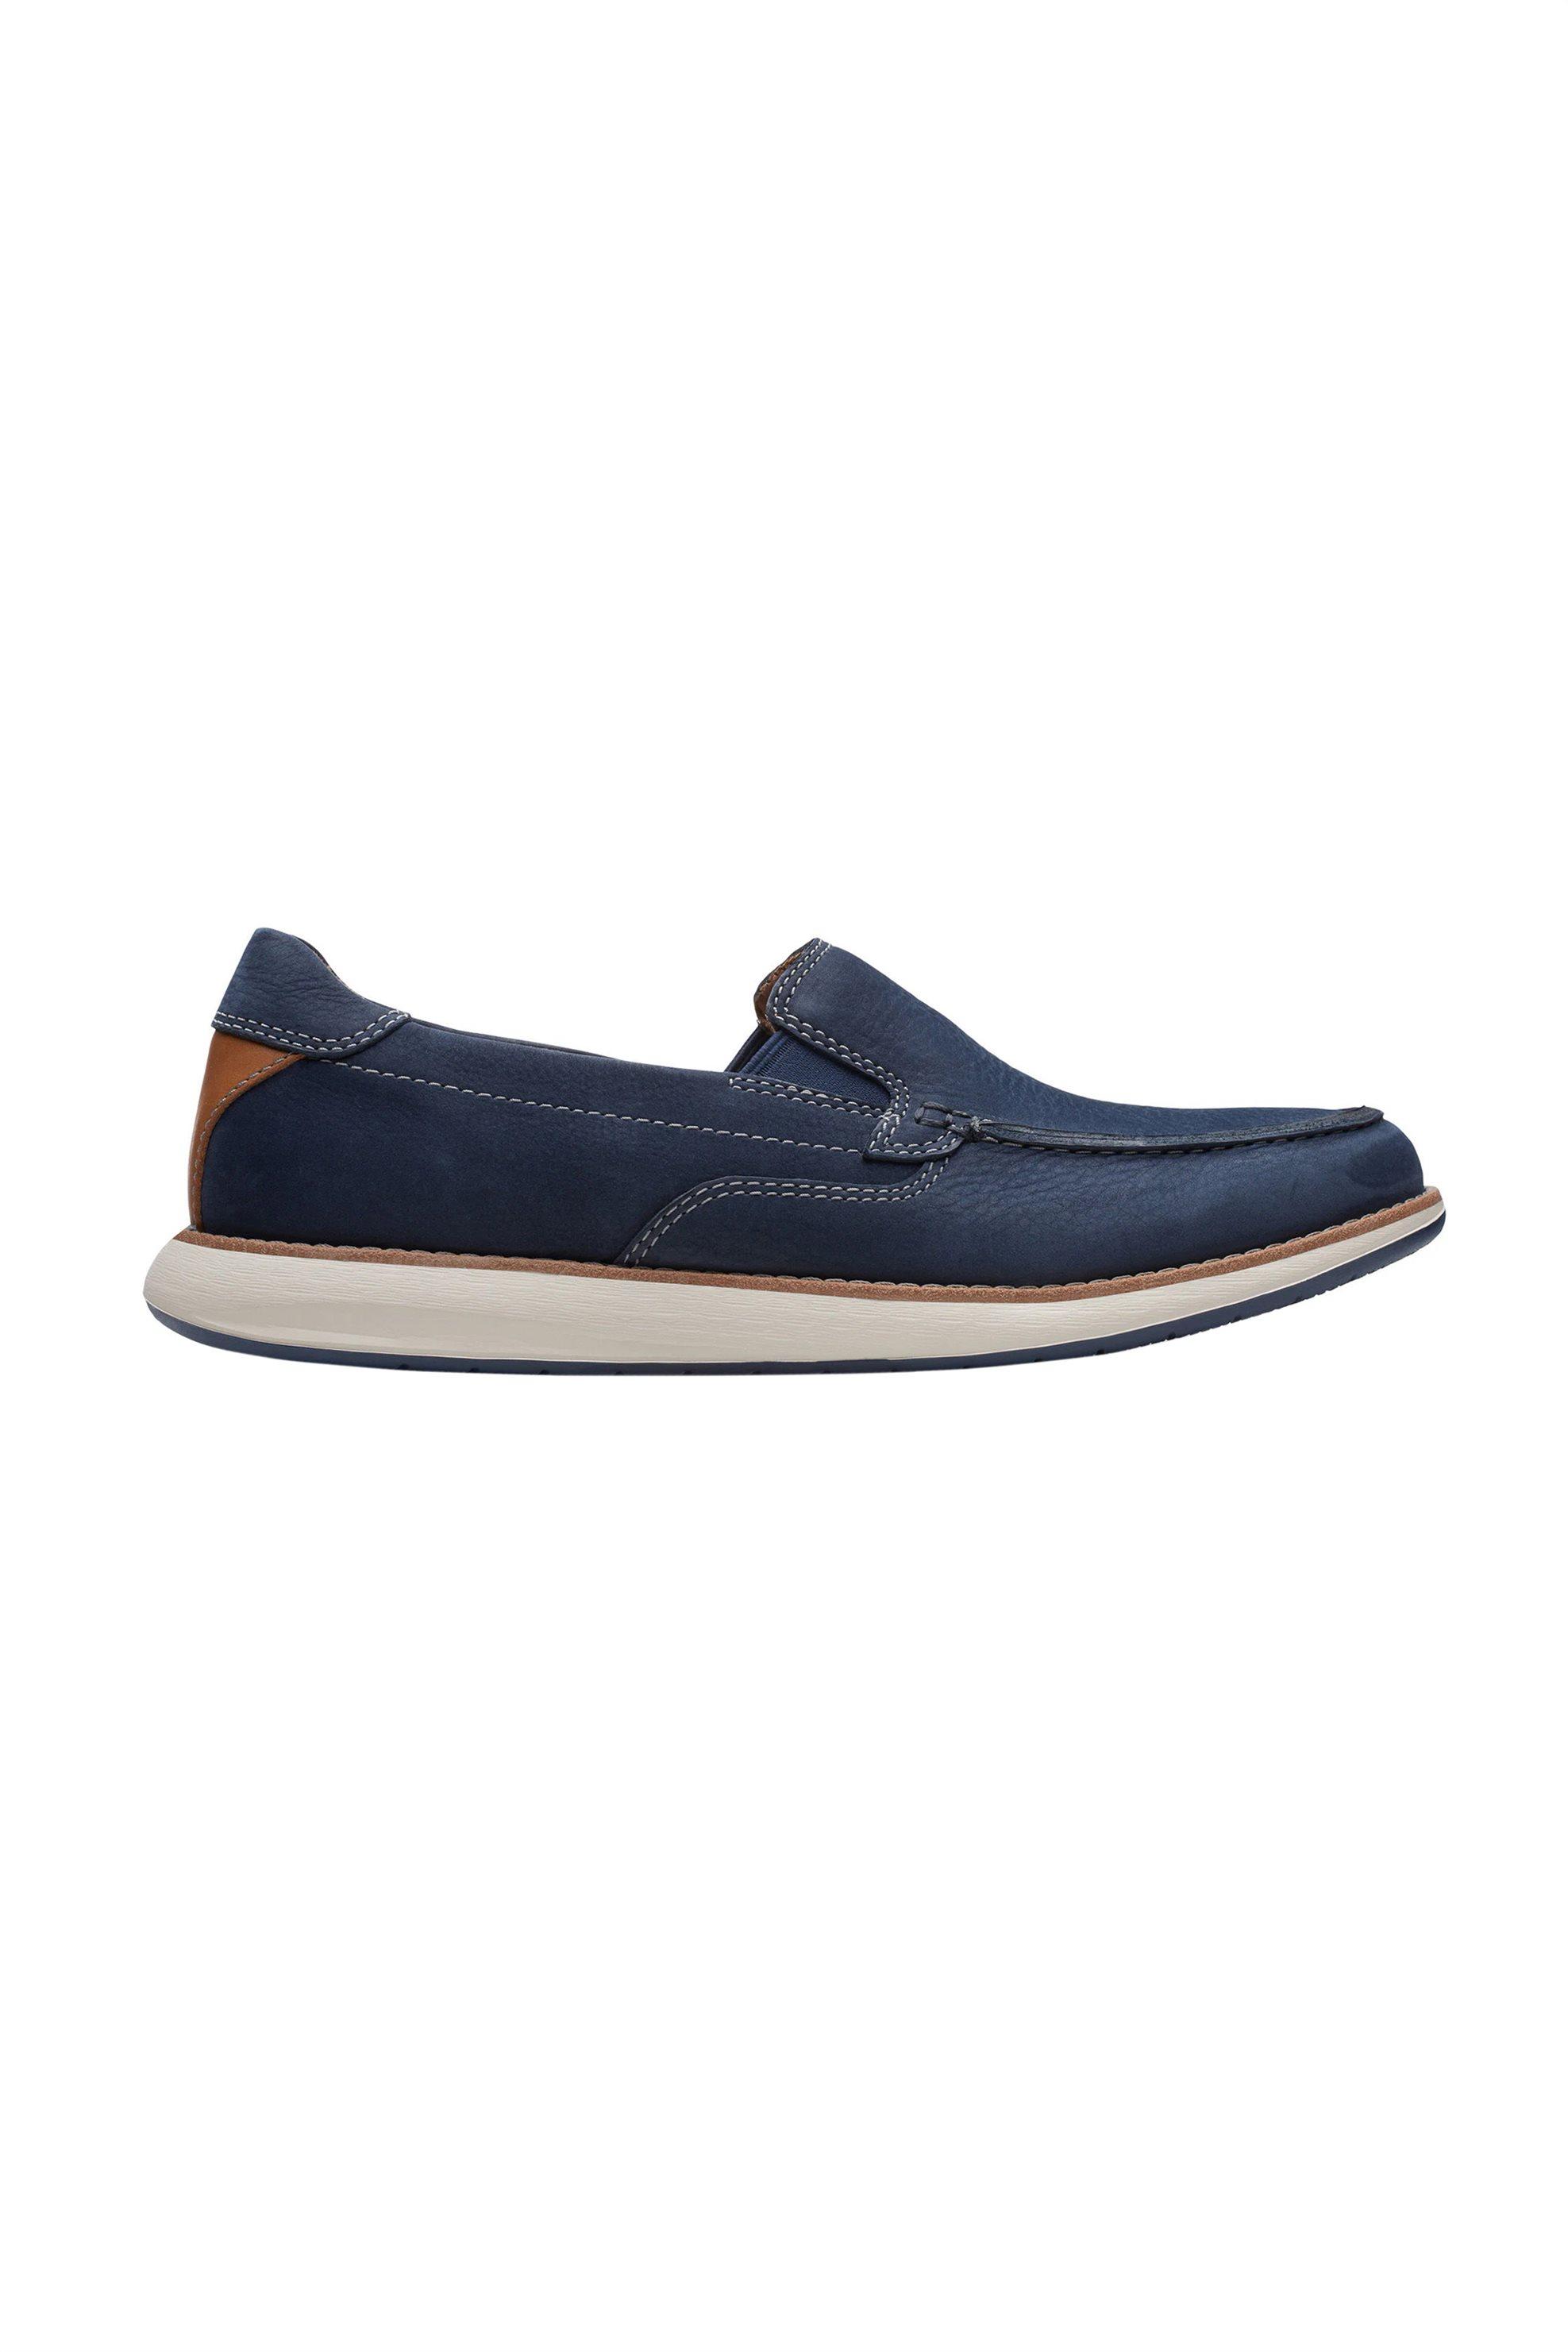 Clarks ανδρικά δερμάτινα παπούτσια με suede όψη – 26140956 – Μπλε Σκούρο